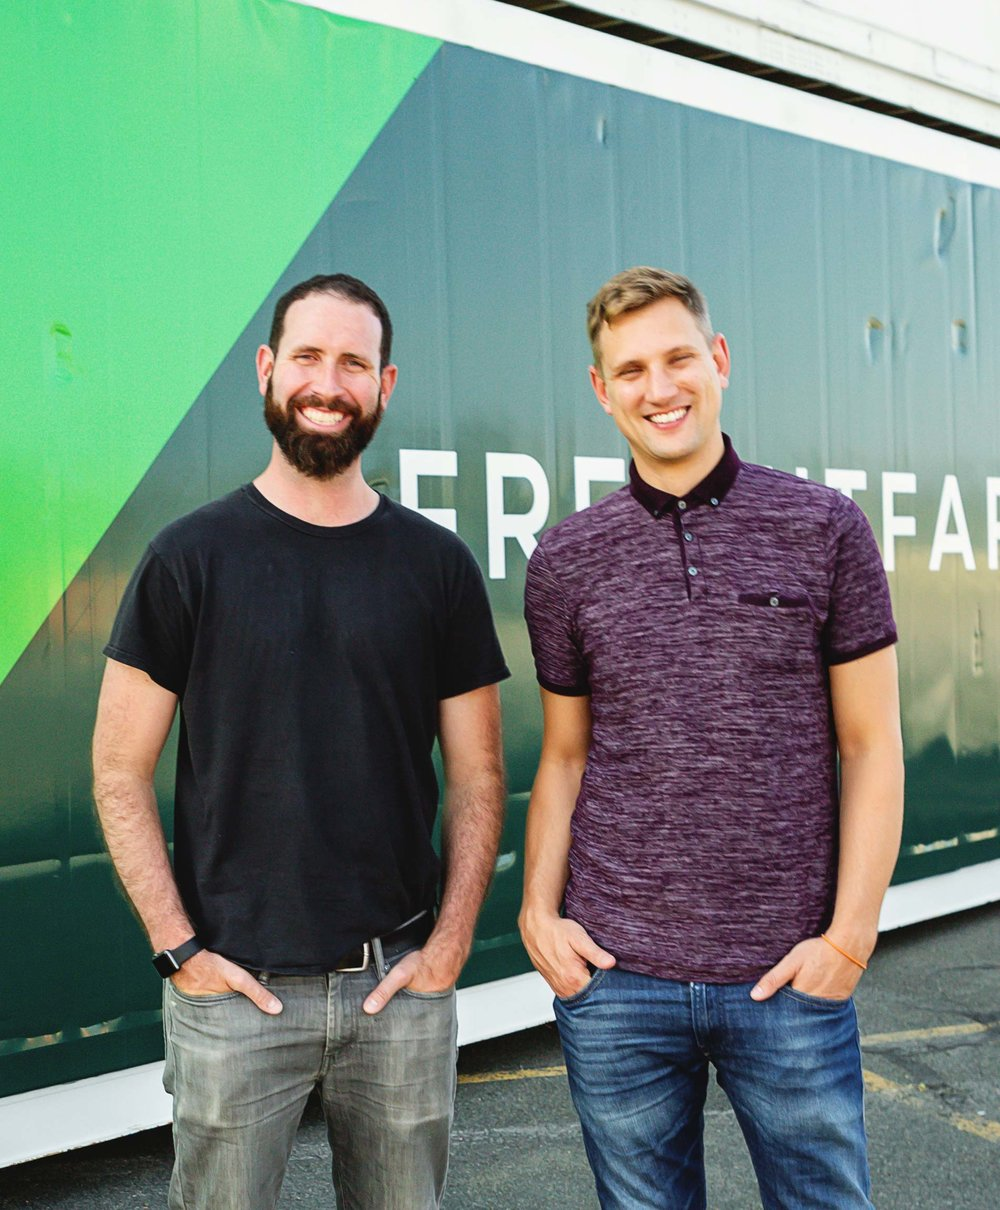 Co-founders Brad McNamara (left) and Jon Friedman (right) at Freight Farms headquarters in Boston, MA.